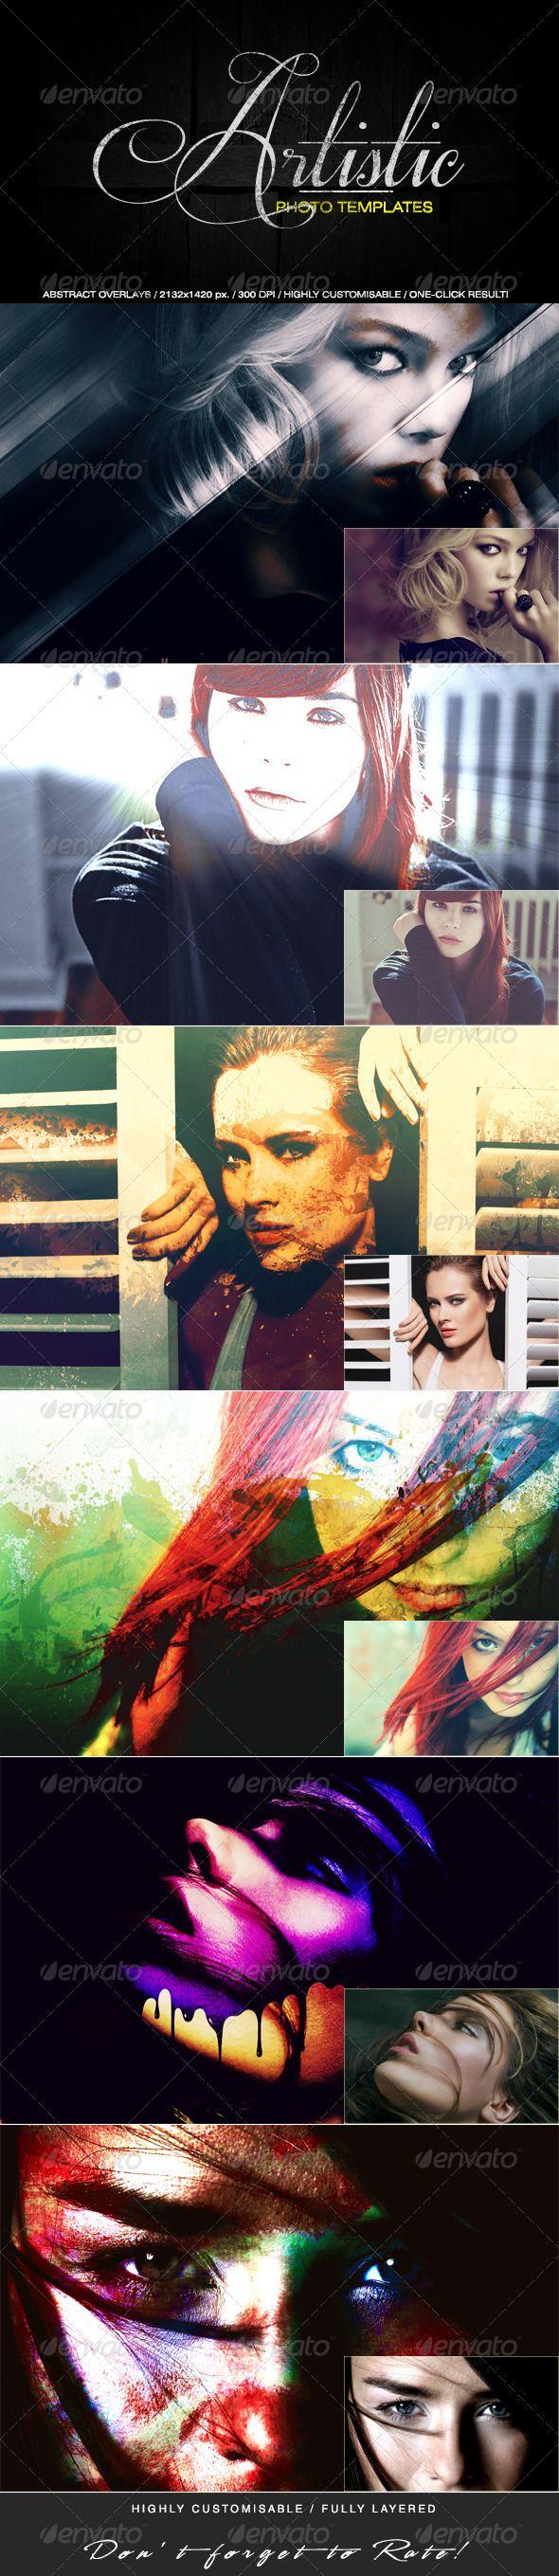 Artistic Photo Templates